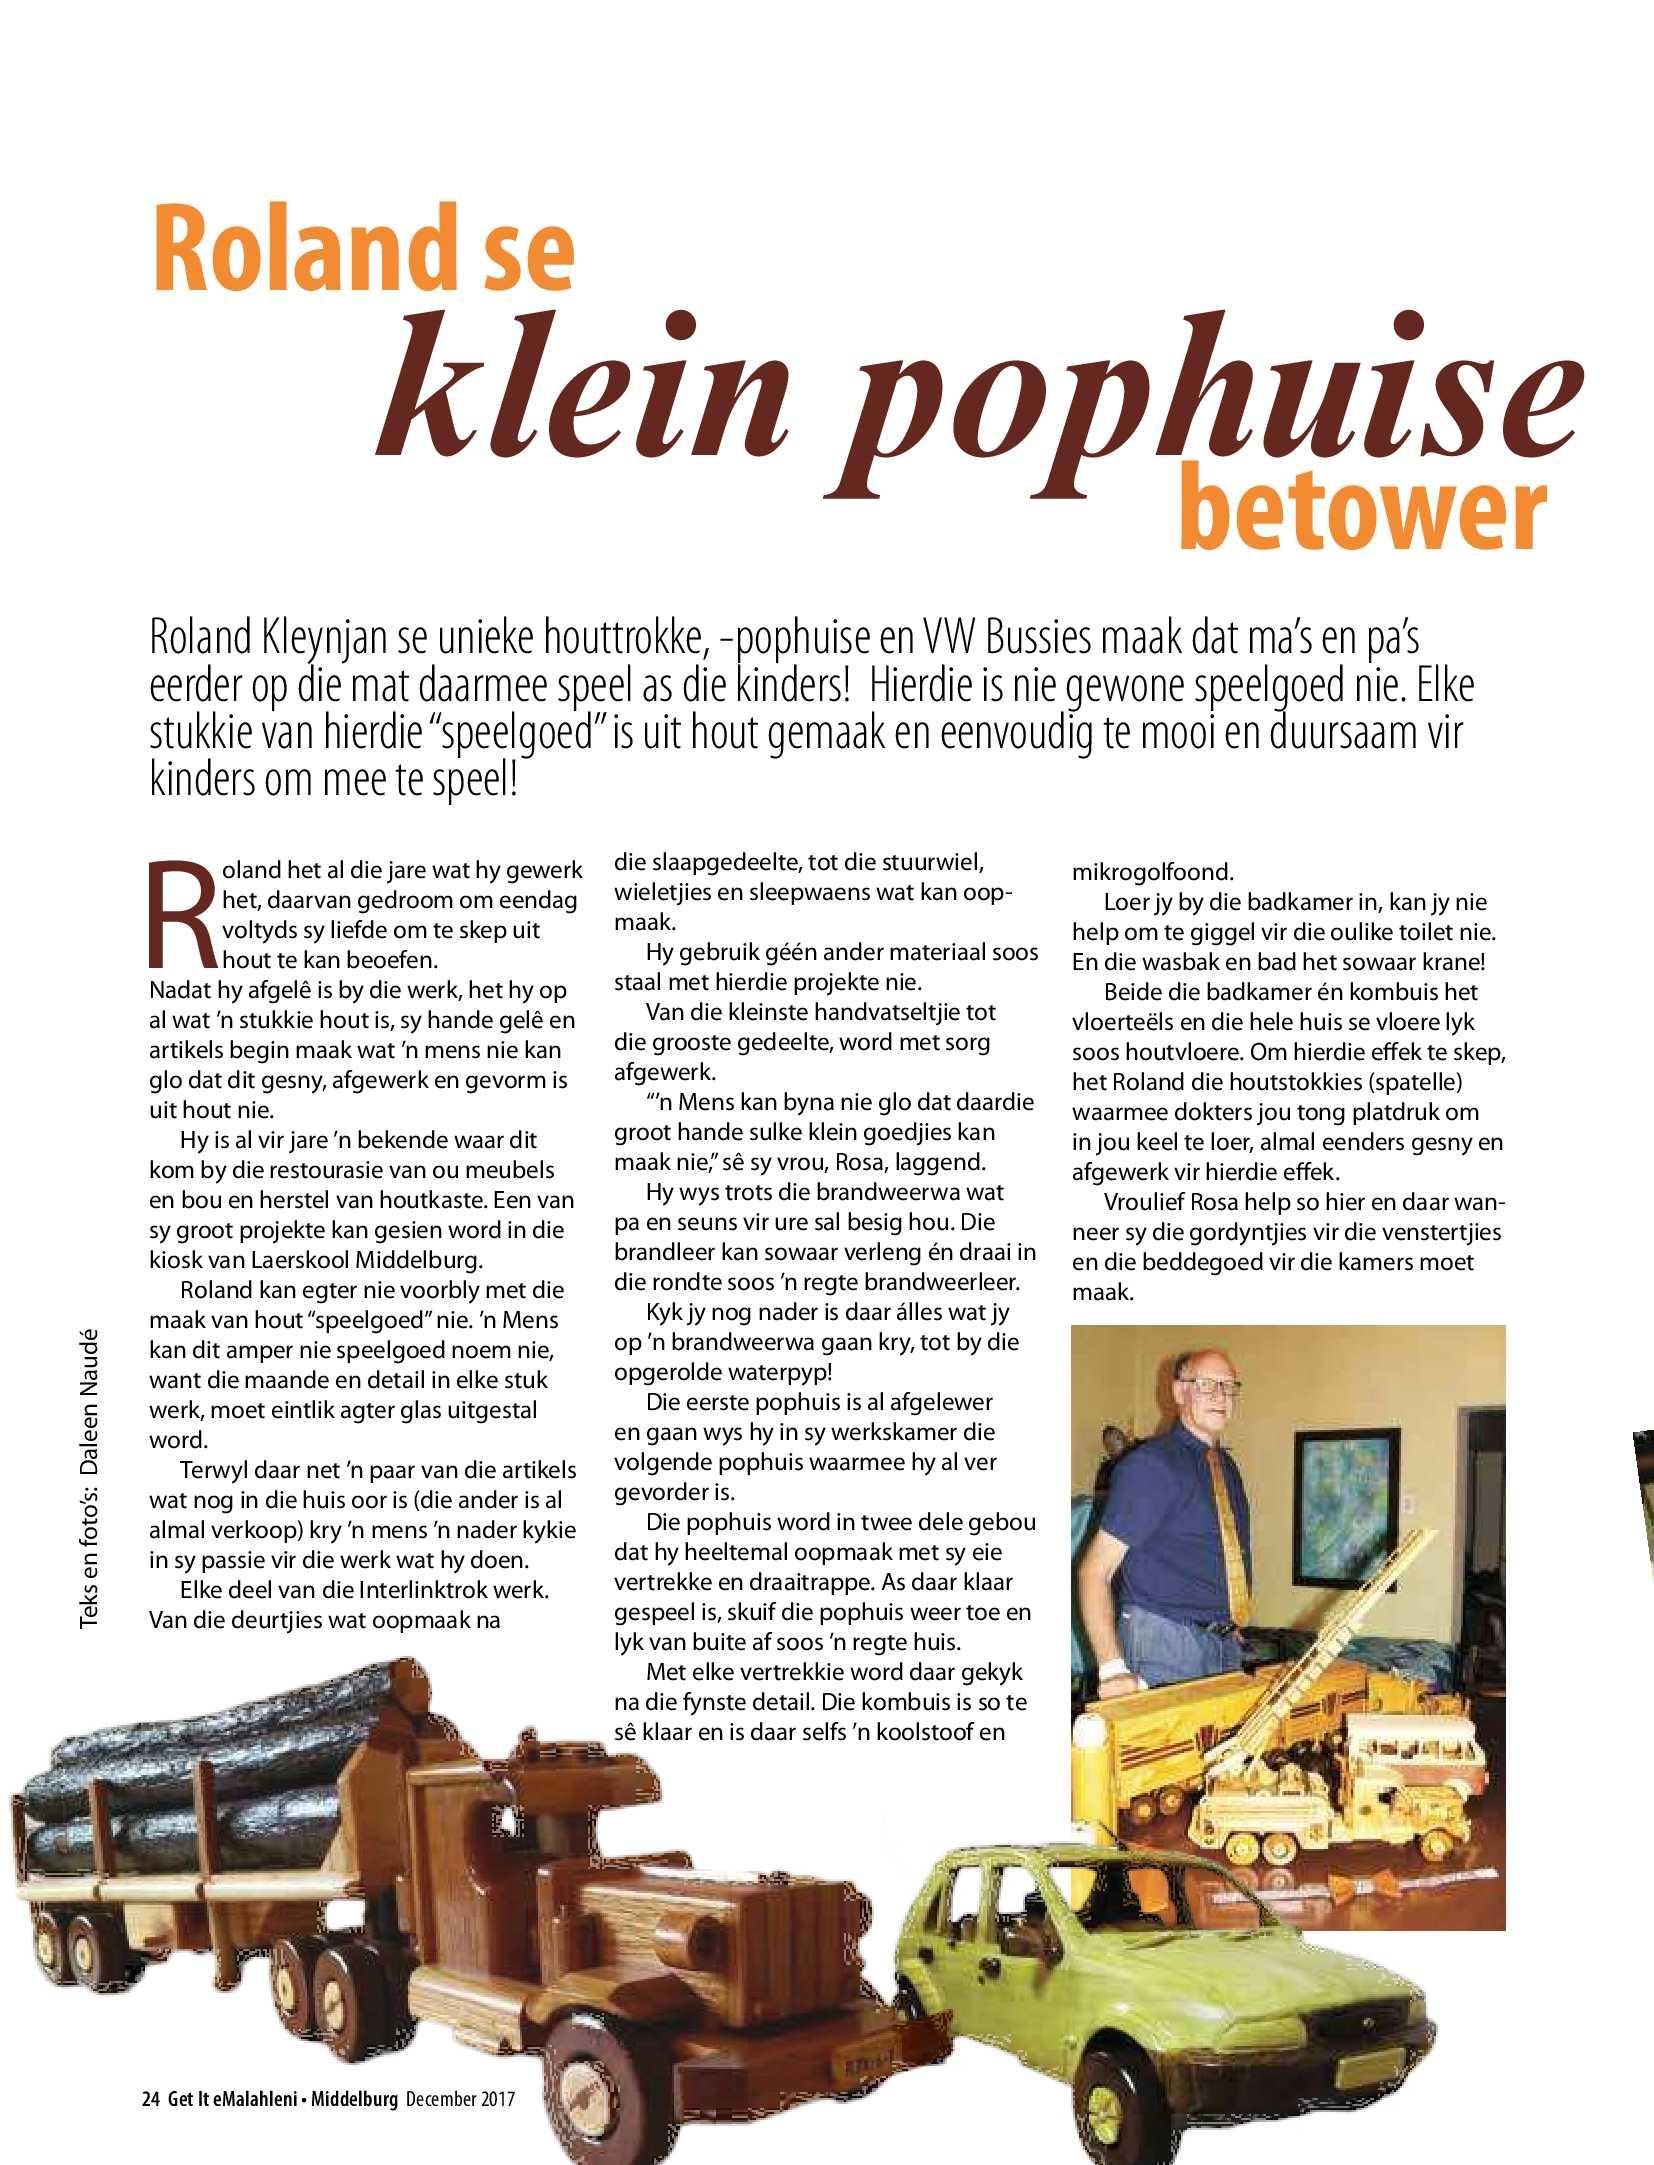 get-mb-des-2017-epapers-page-26